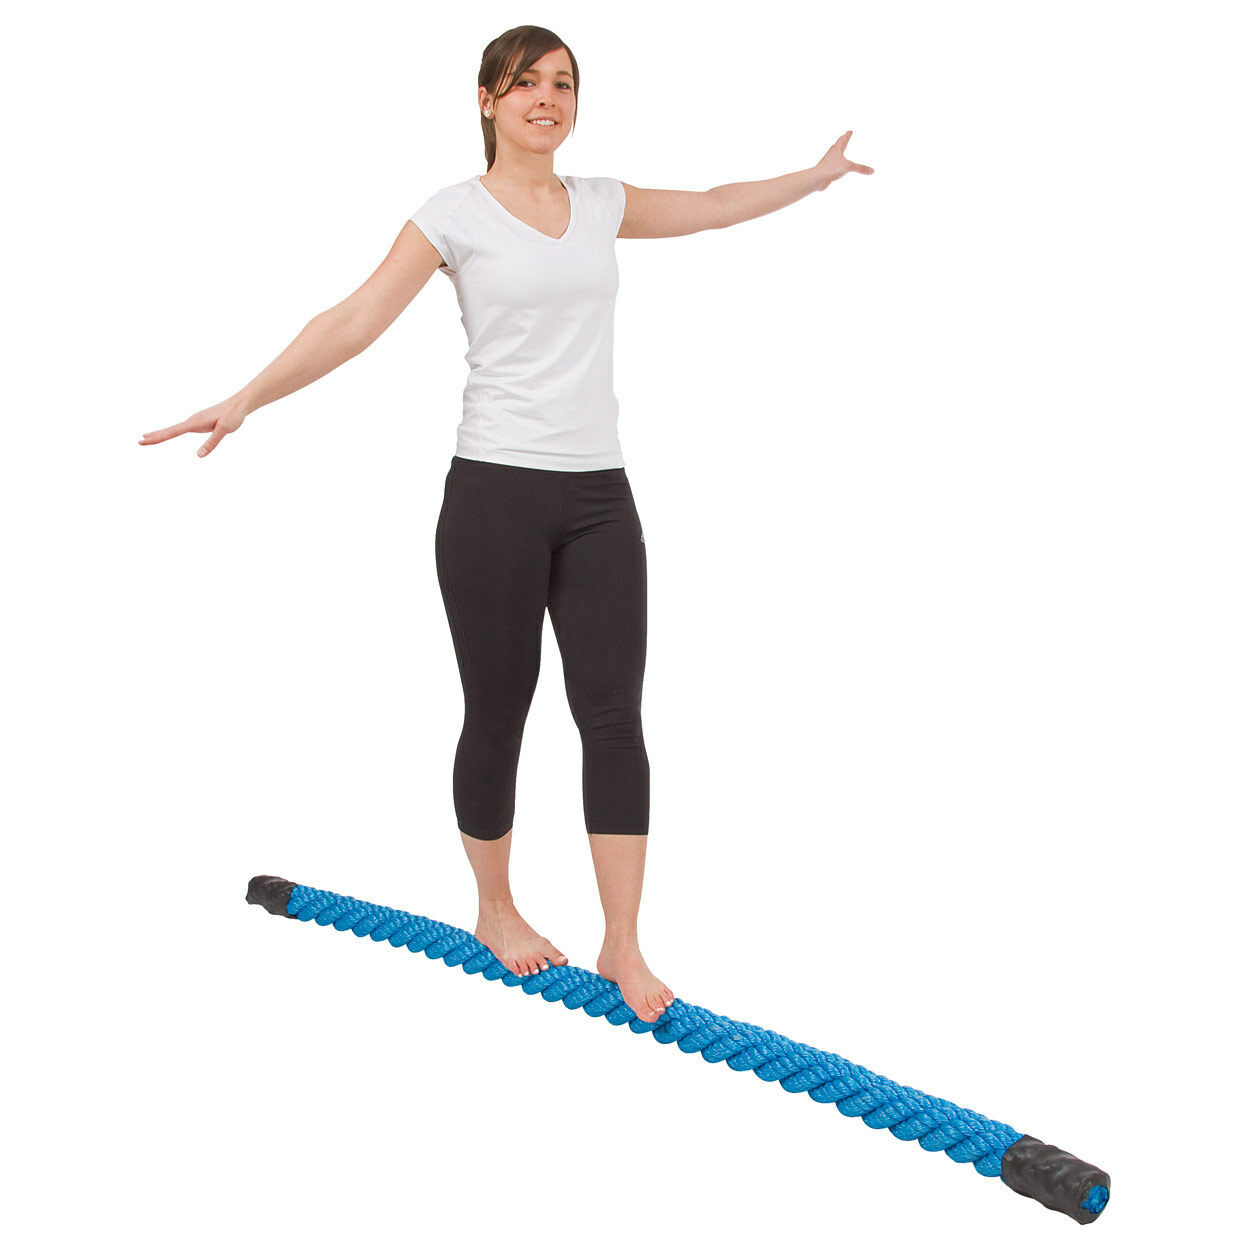 Balanciertau aus Kunststoff, Kunststoff, Kunststoff, Balancetrainer, Balancier Trainer, 200 cm e3bce1